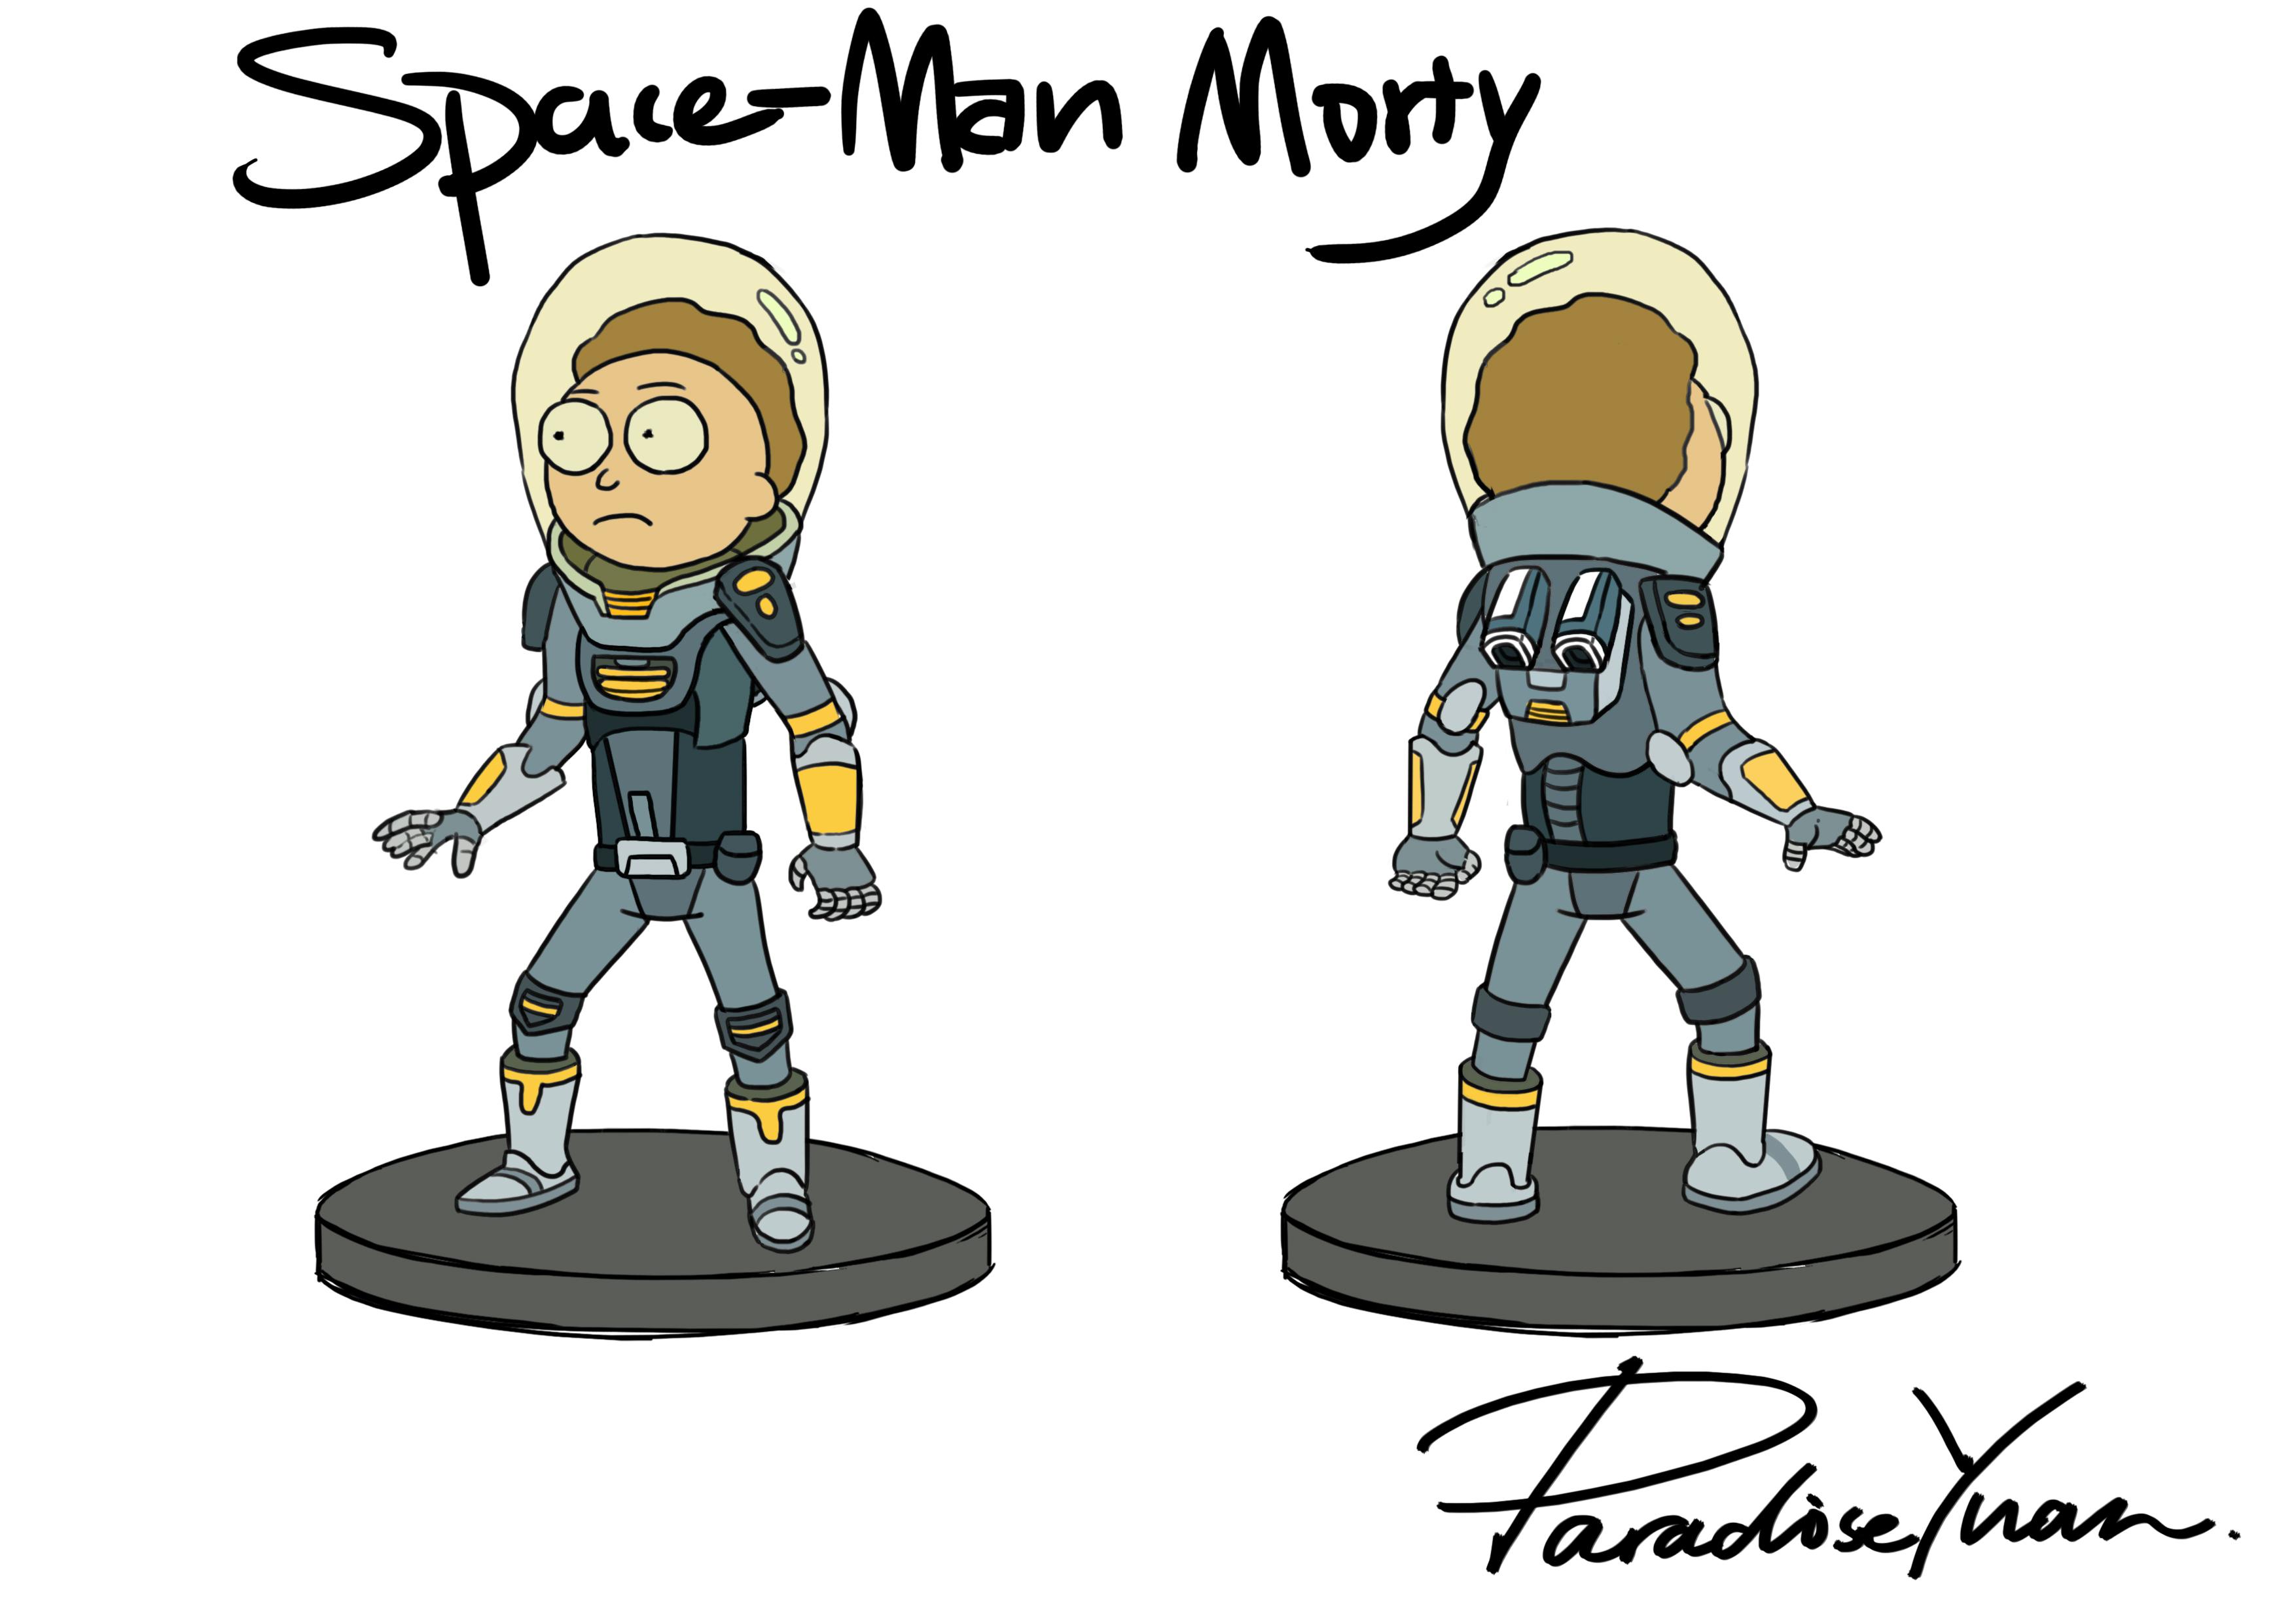 spaceman morty.jpg